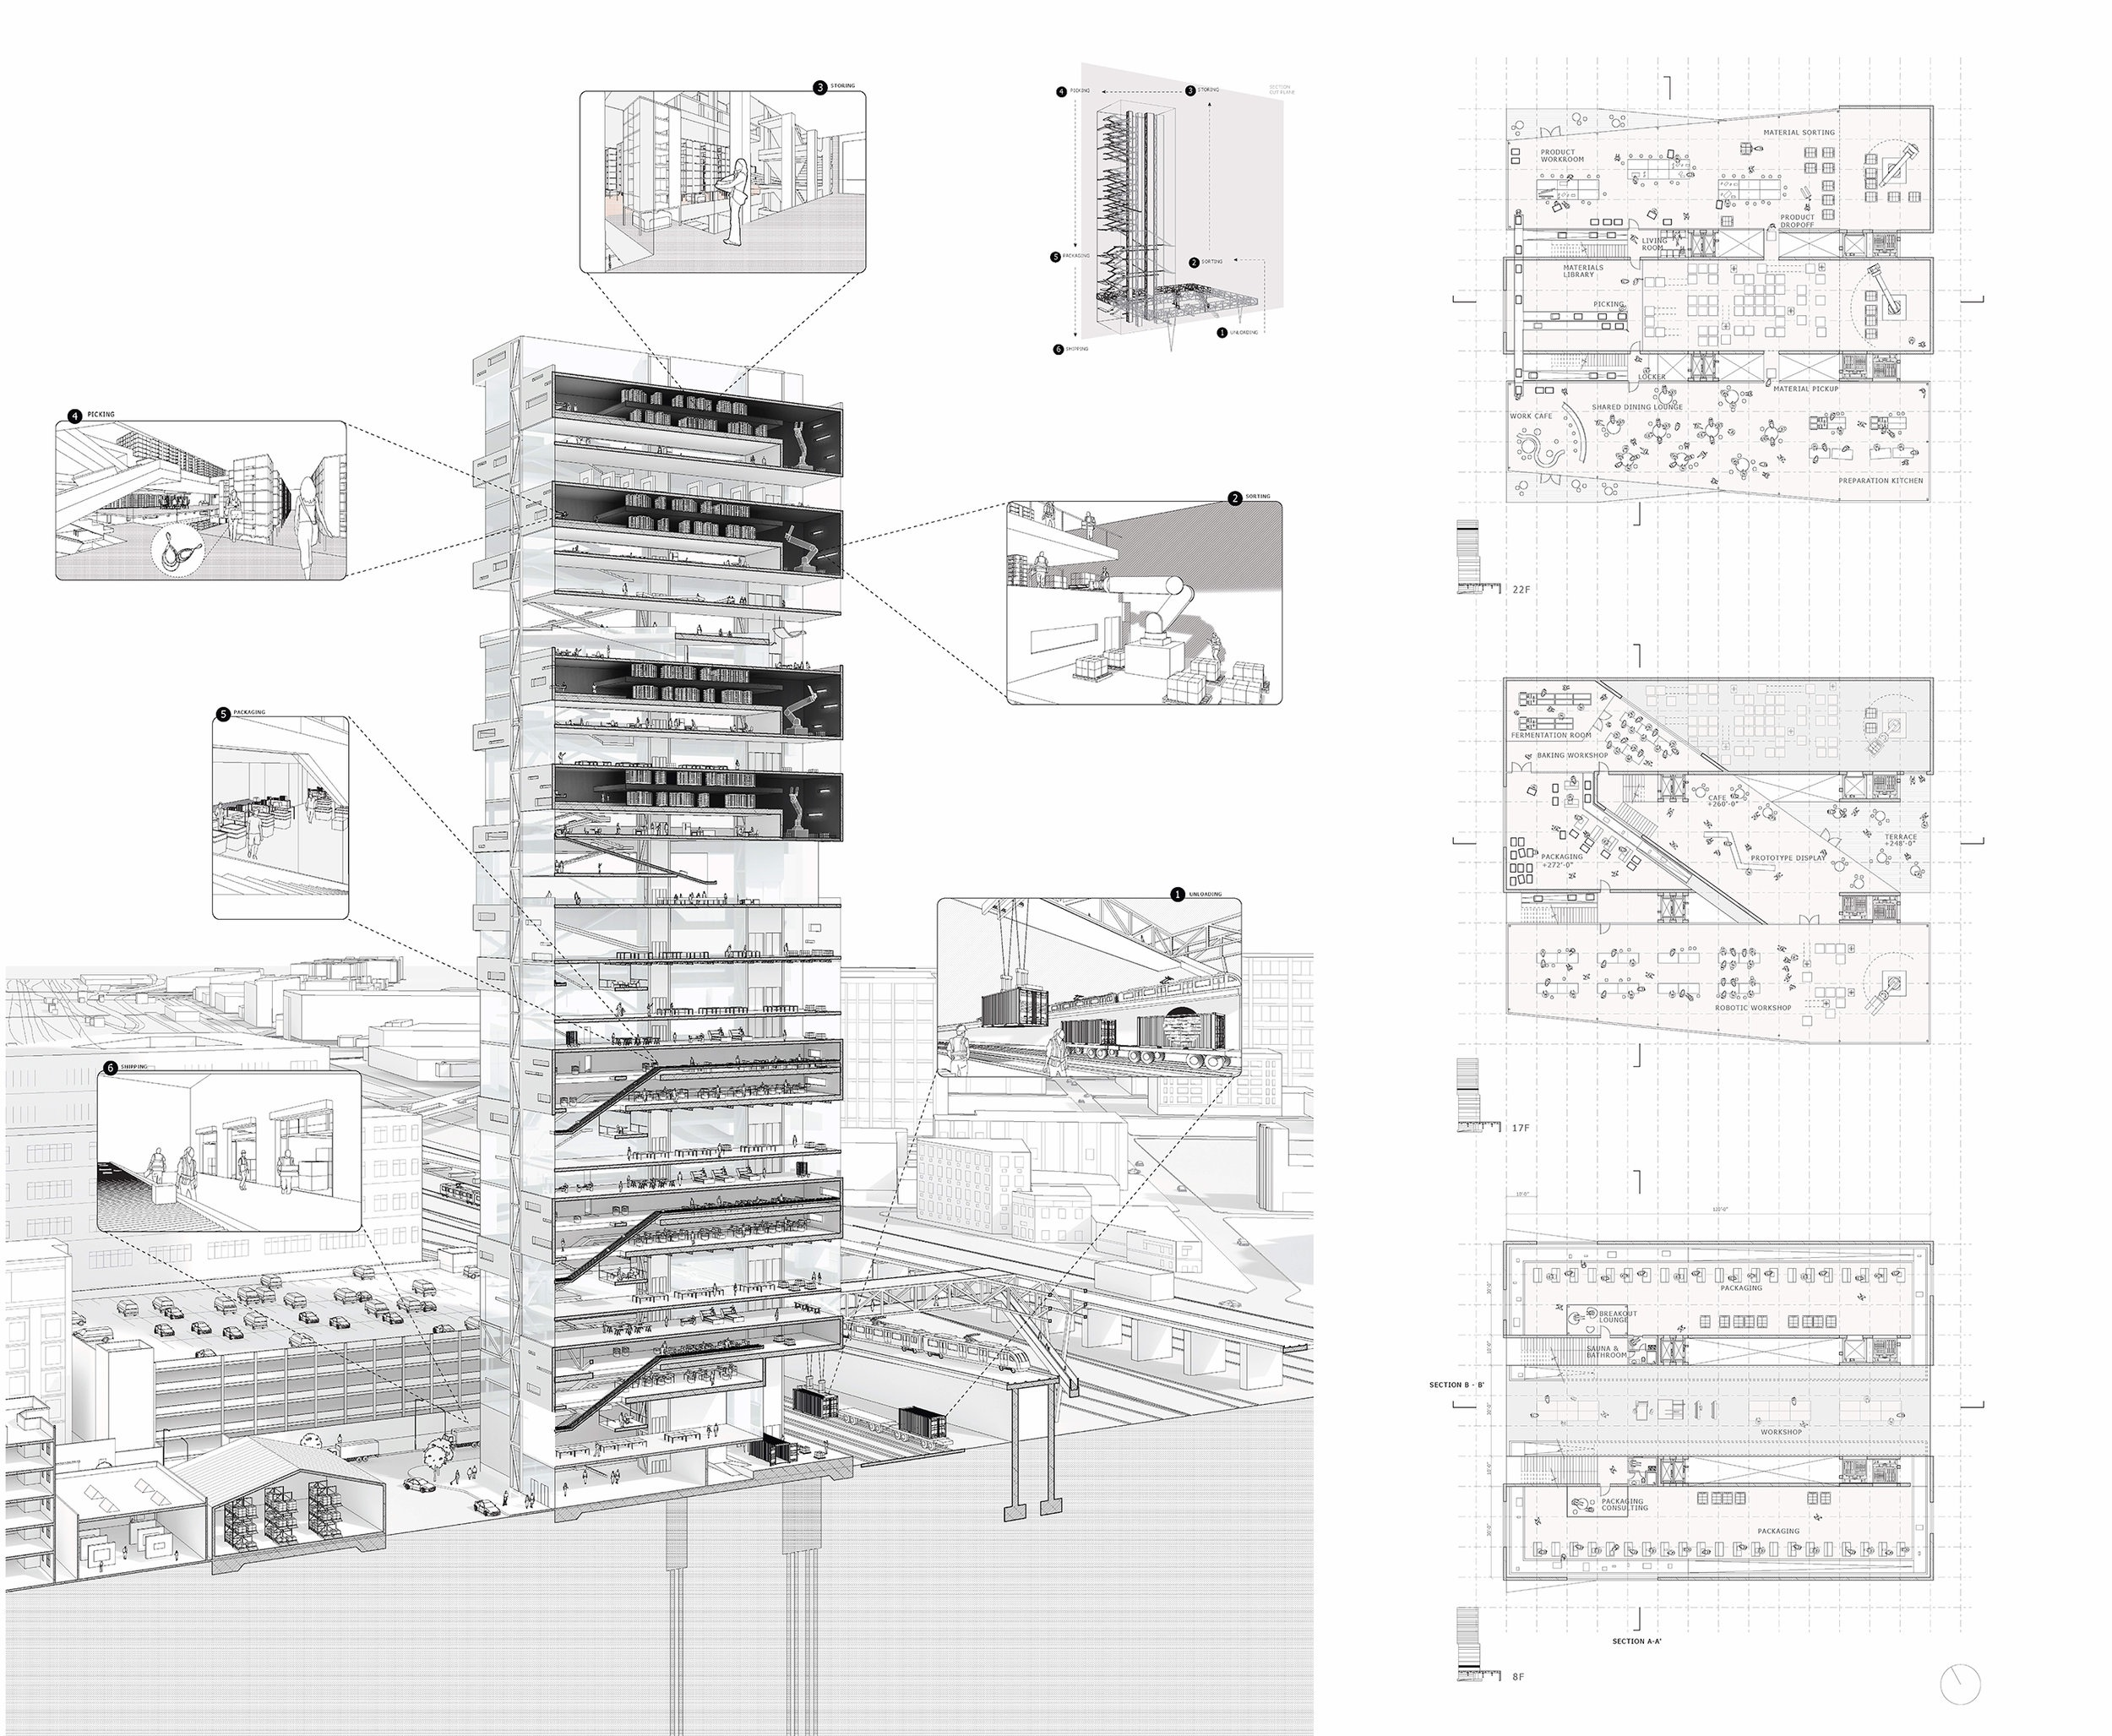 EW+section+%26+plans-01_ss.jpg